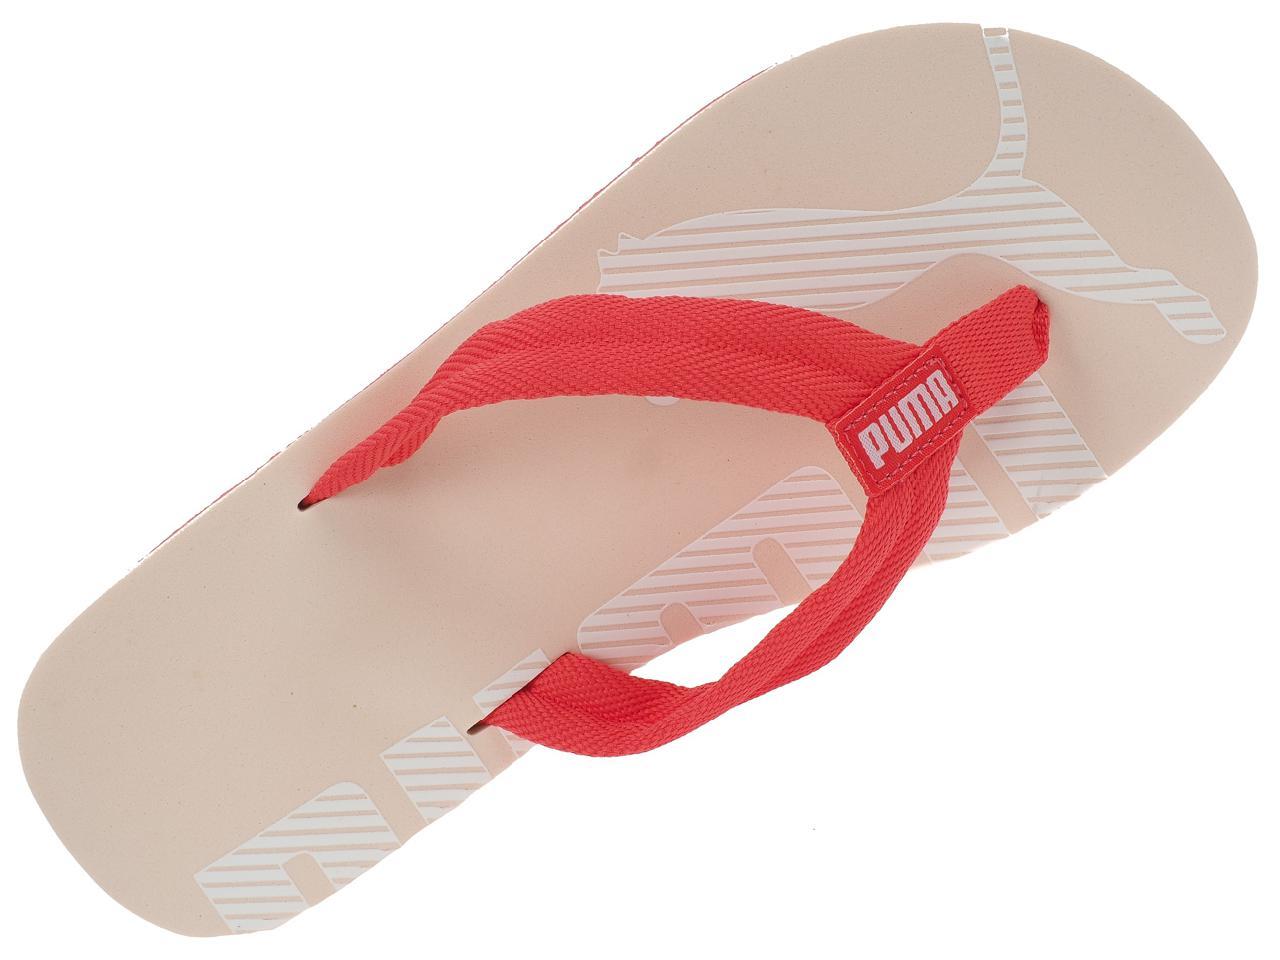 Latschen-Flip-Flops-Puma-Epic-Flip-v2-Rosa-Flip-Flops-G-Rosa-44775-Neu Indexbild 2